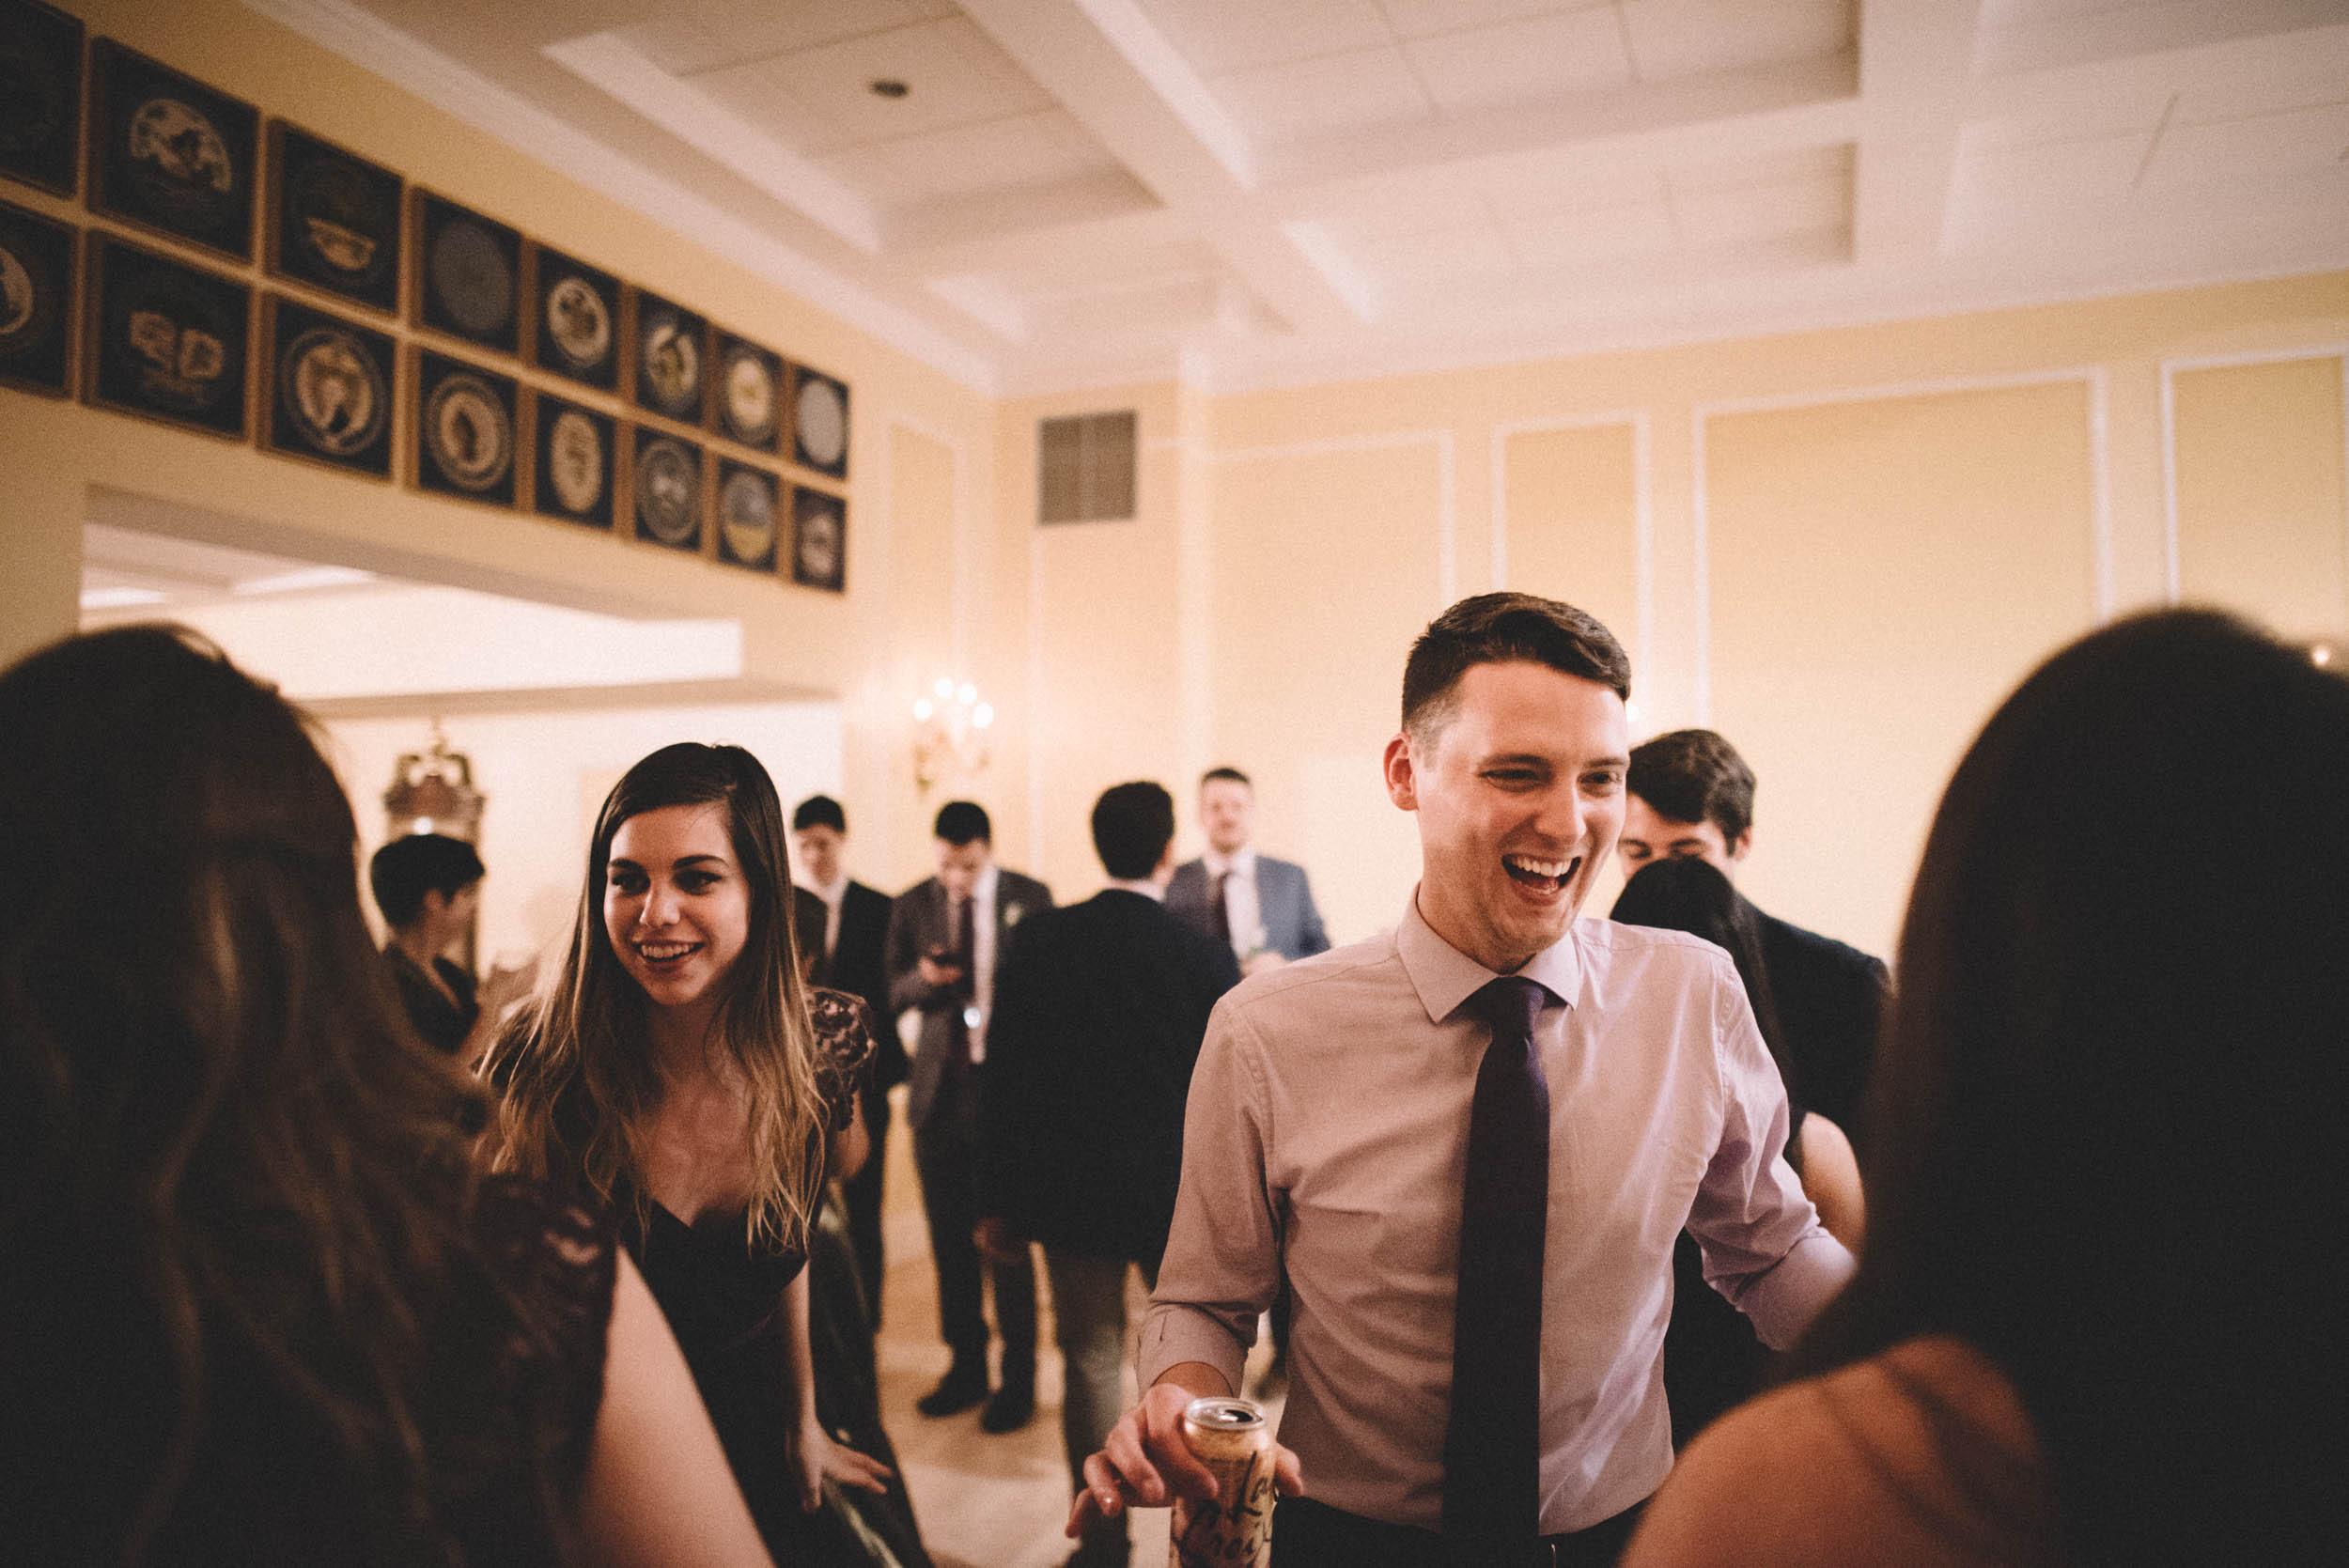 Dumbarton-House-wedding-92.jpg